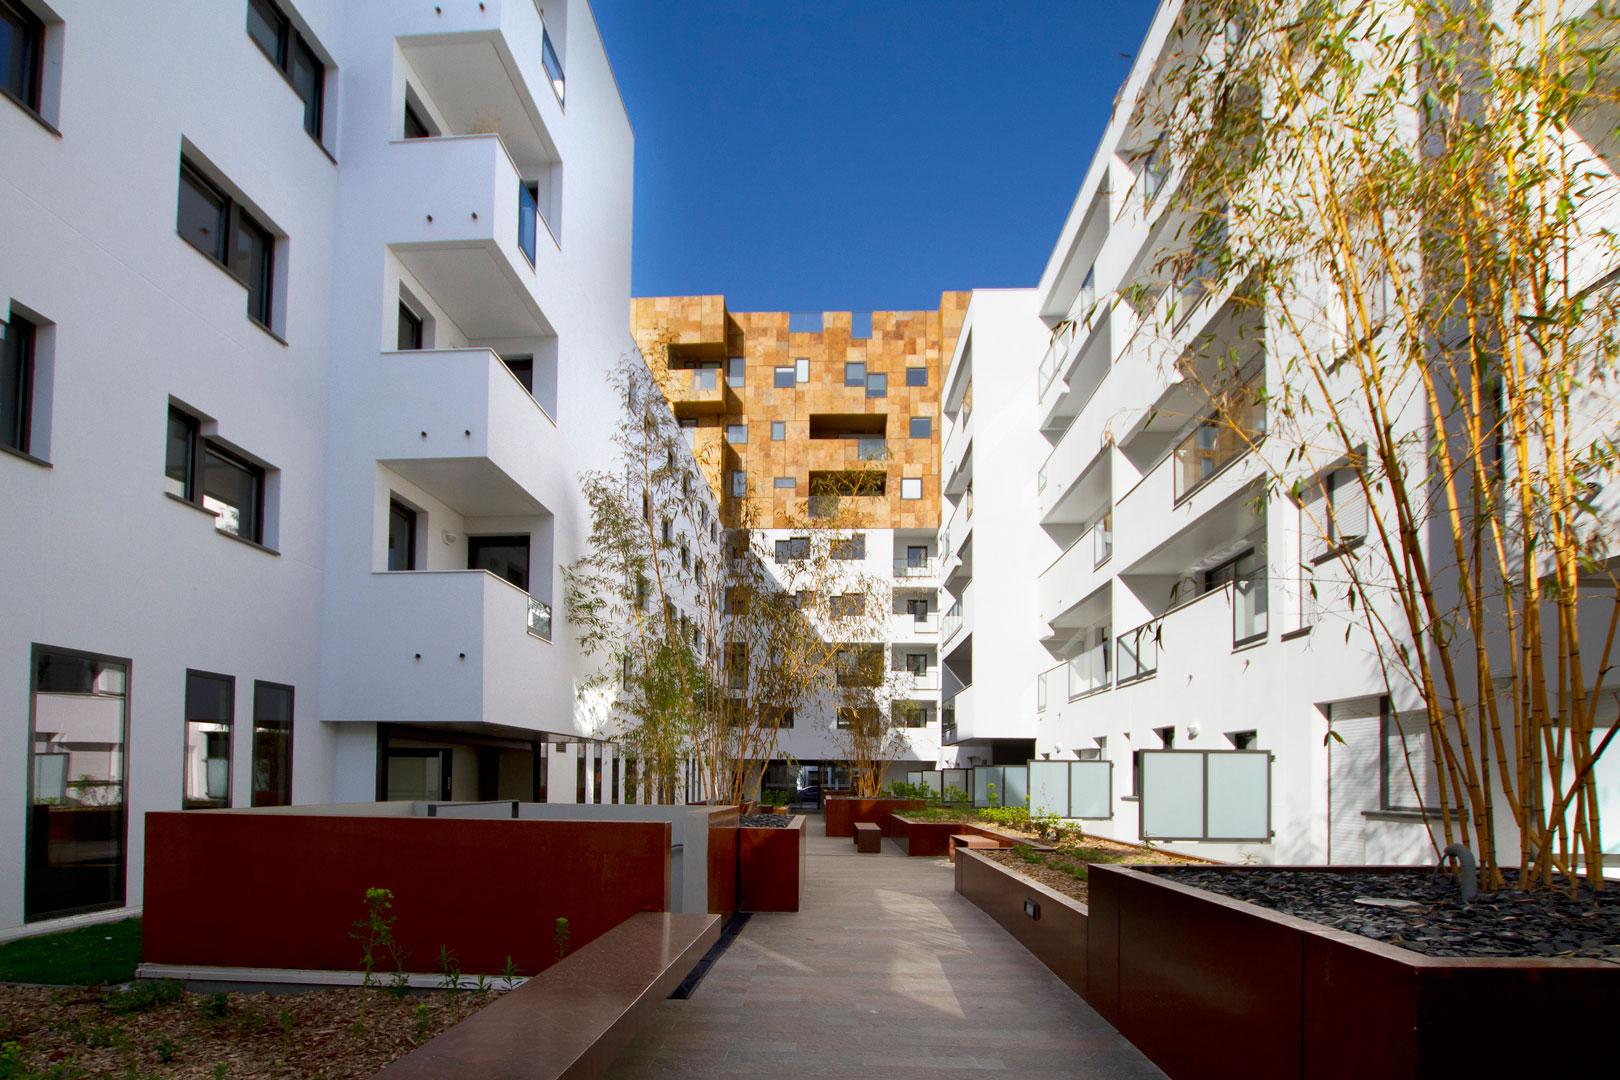 RESIDENCE PEY BERLAND - BORDEAUX